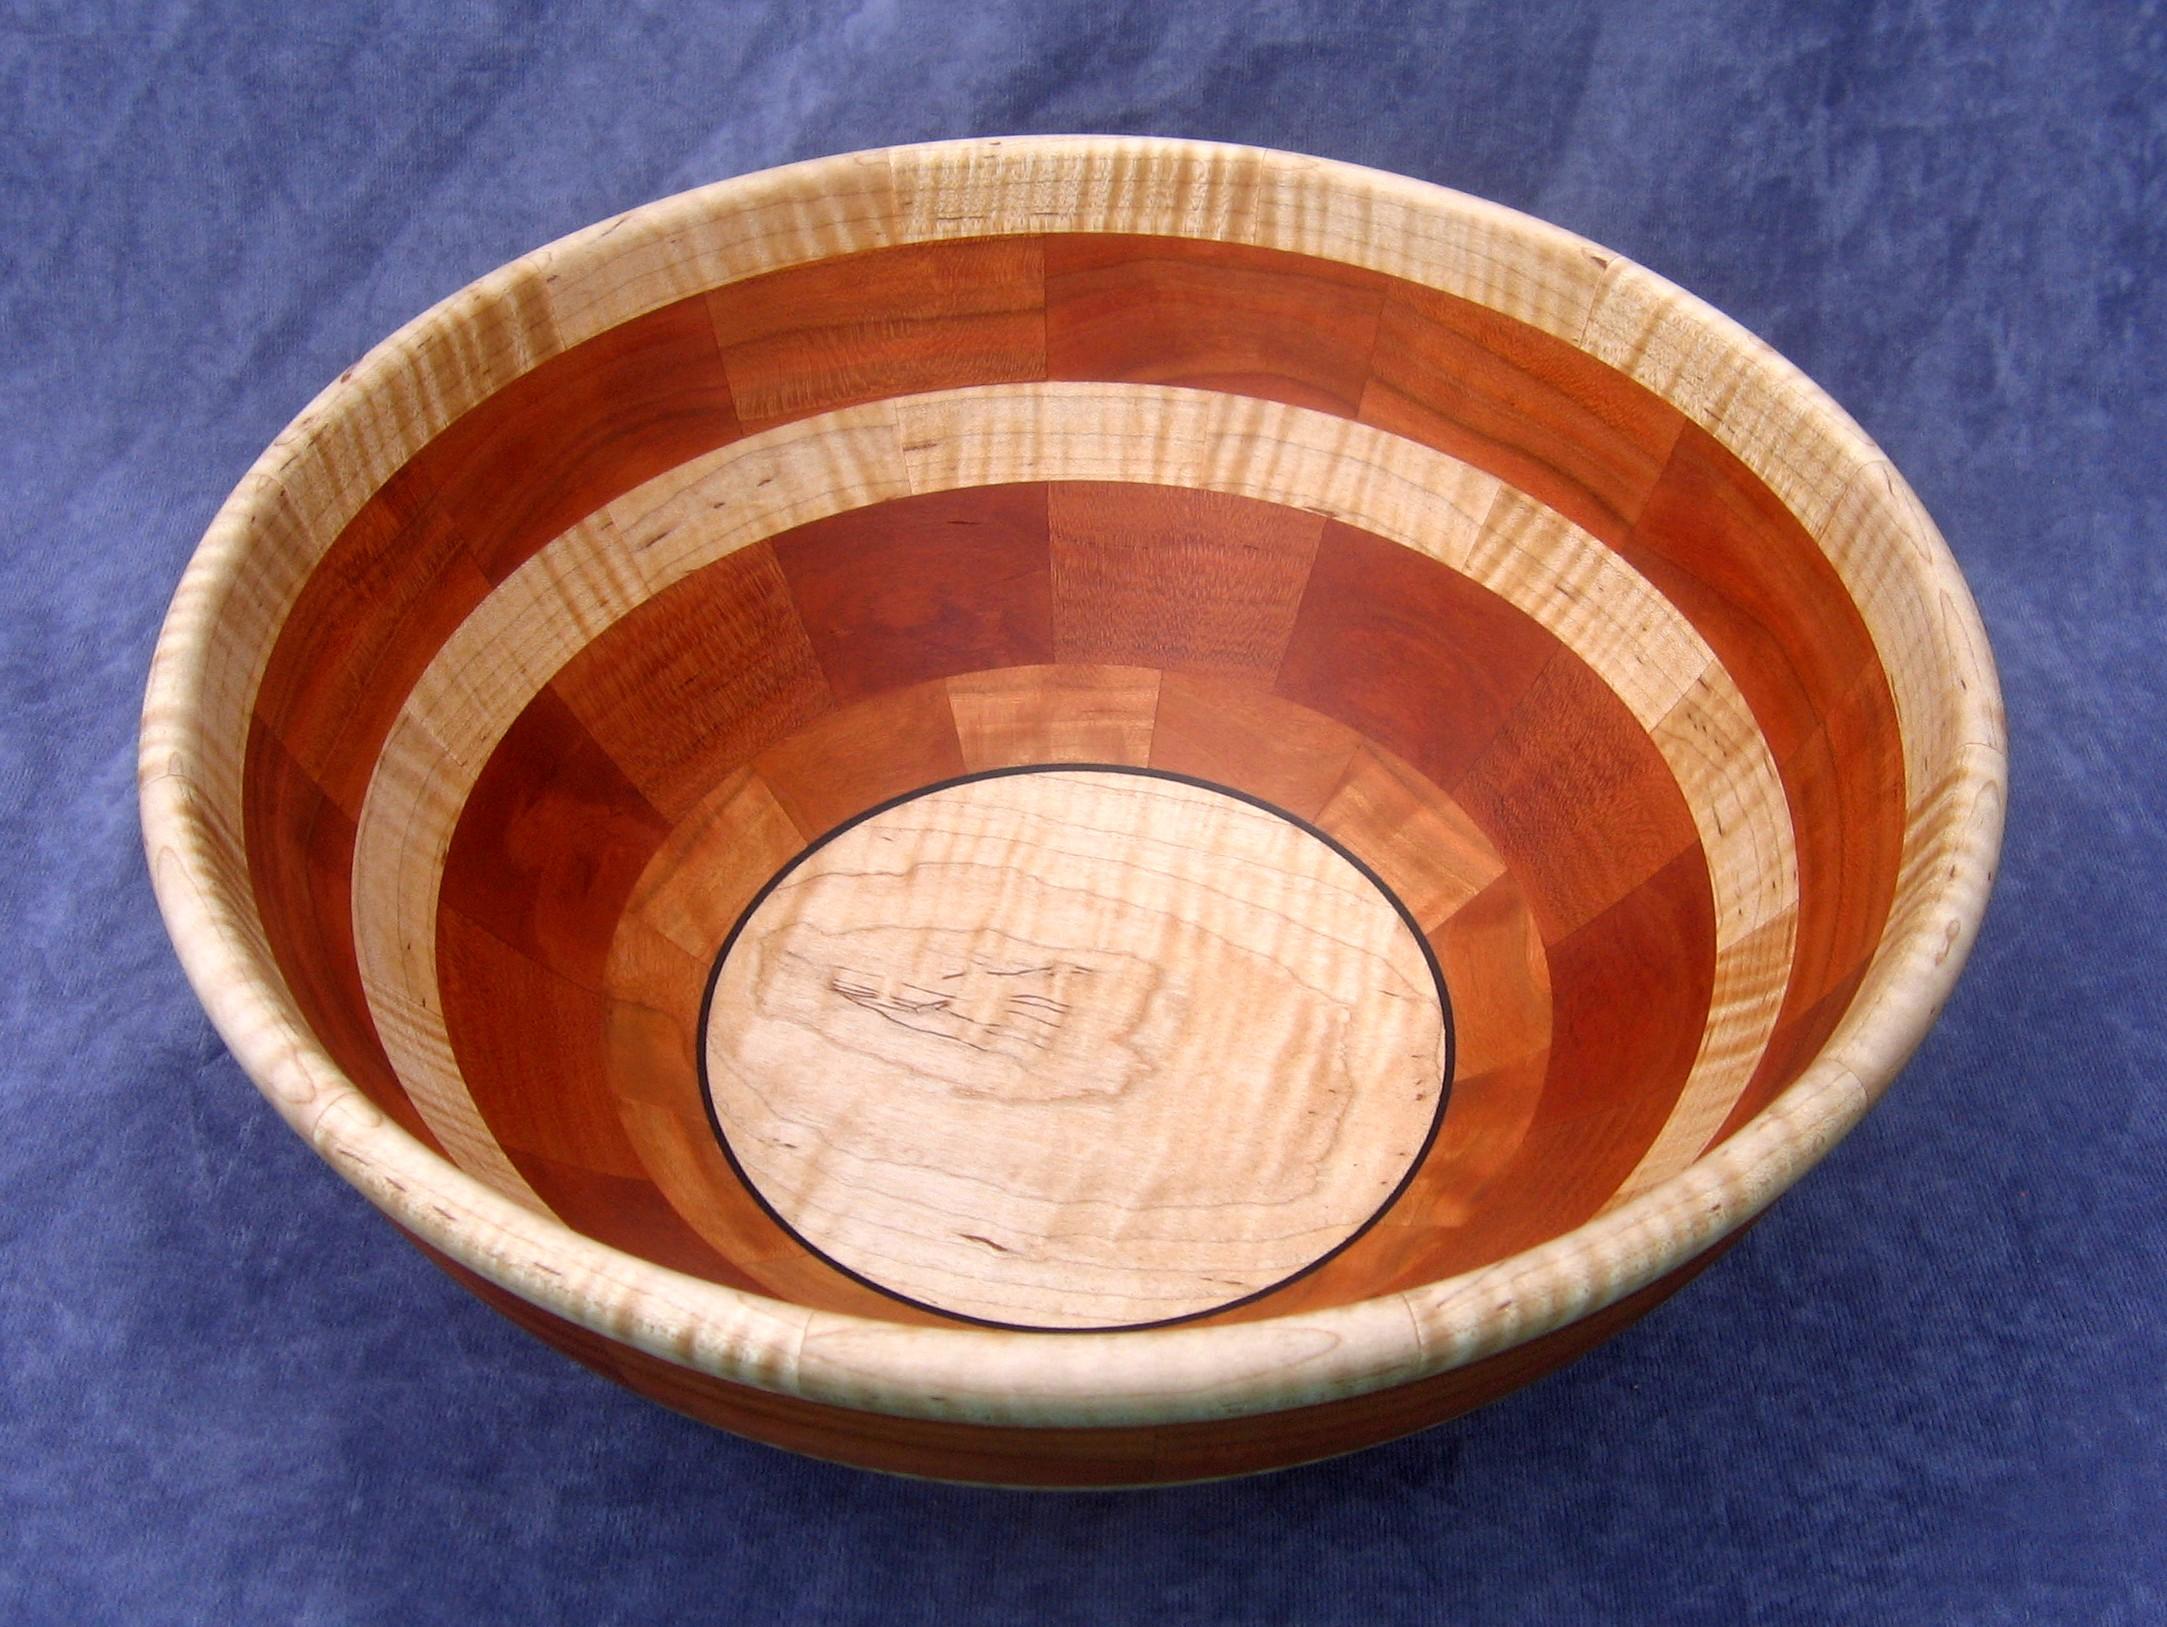 Segmented salad bowl